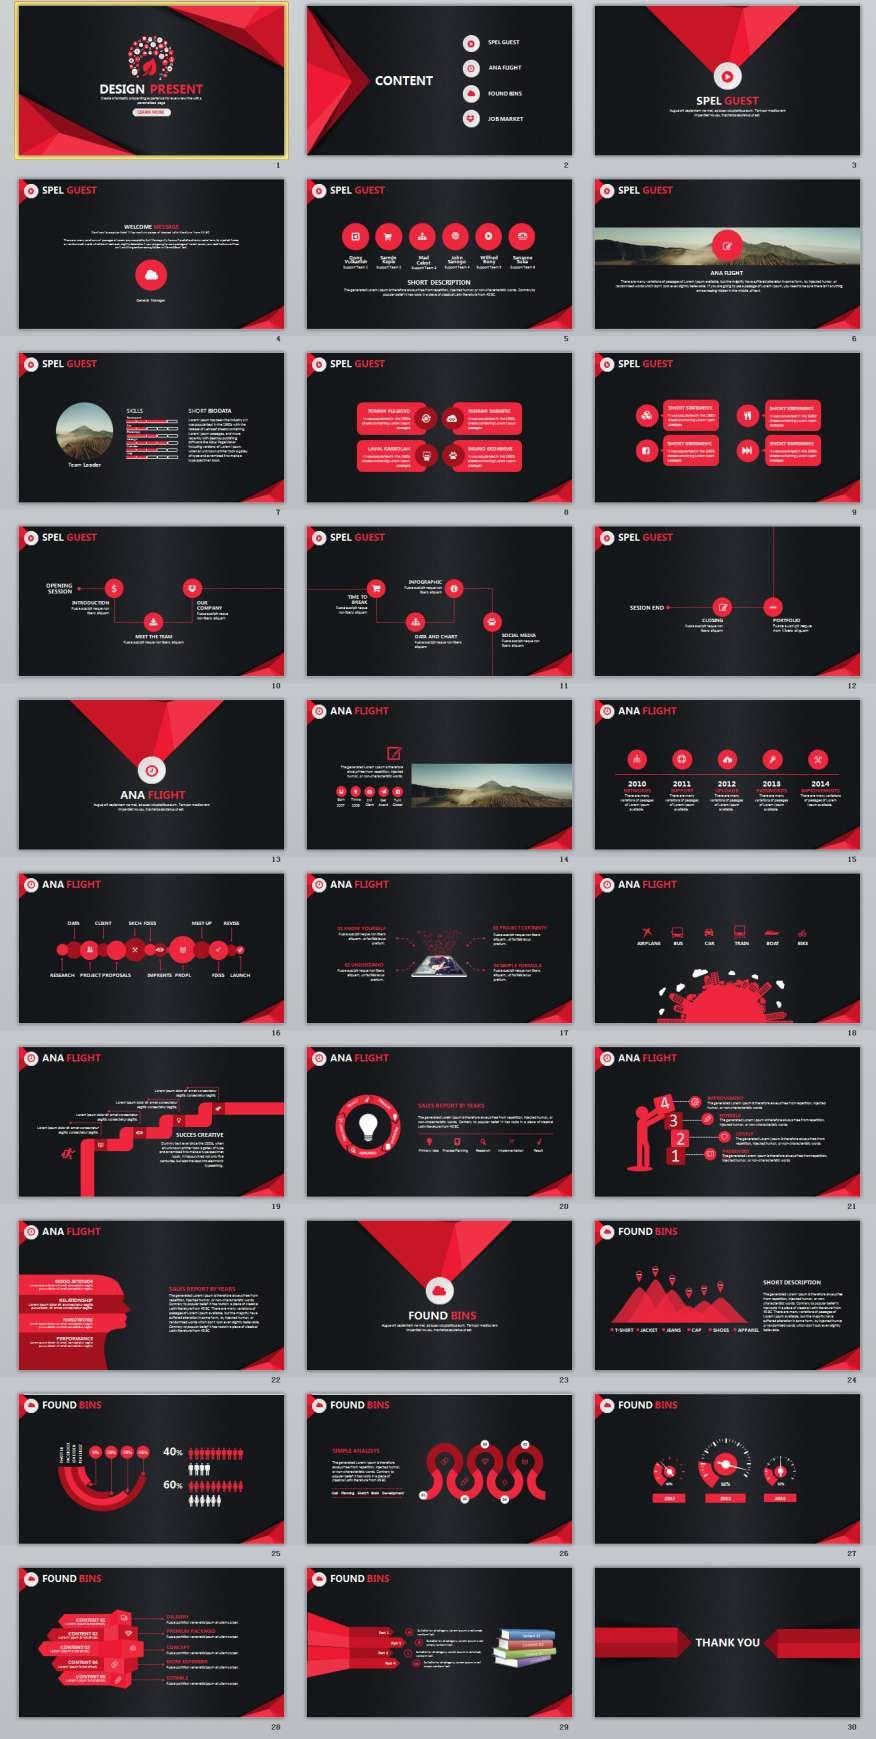 30 design present powerpoint presentation template ppt